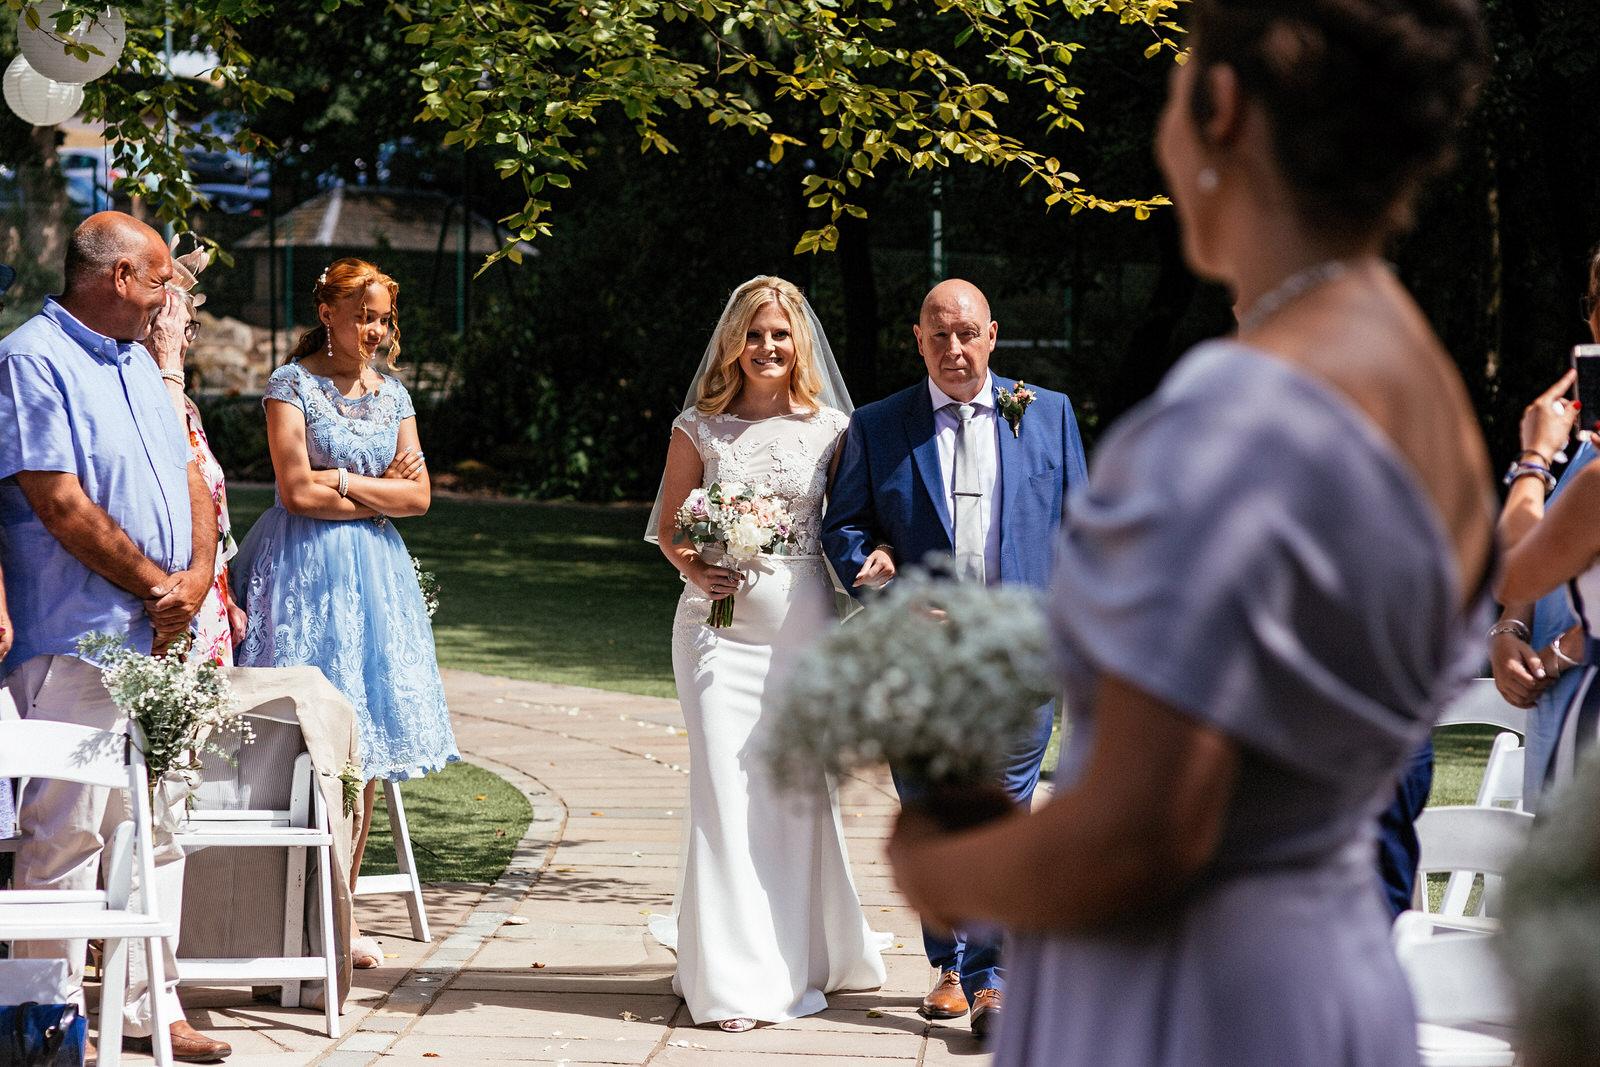 Moddershall-Oaks-Spa-Wedding-Photographer-018.jpg